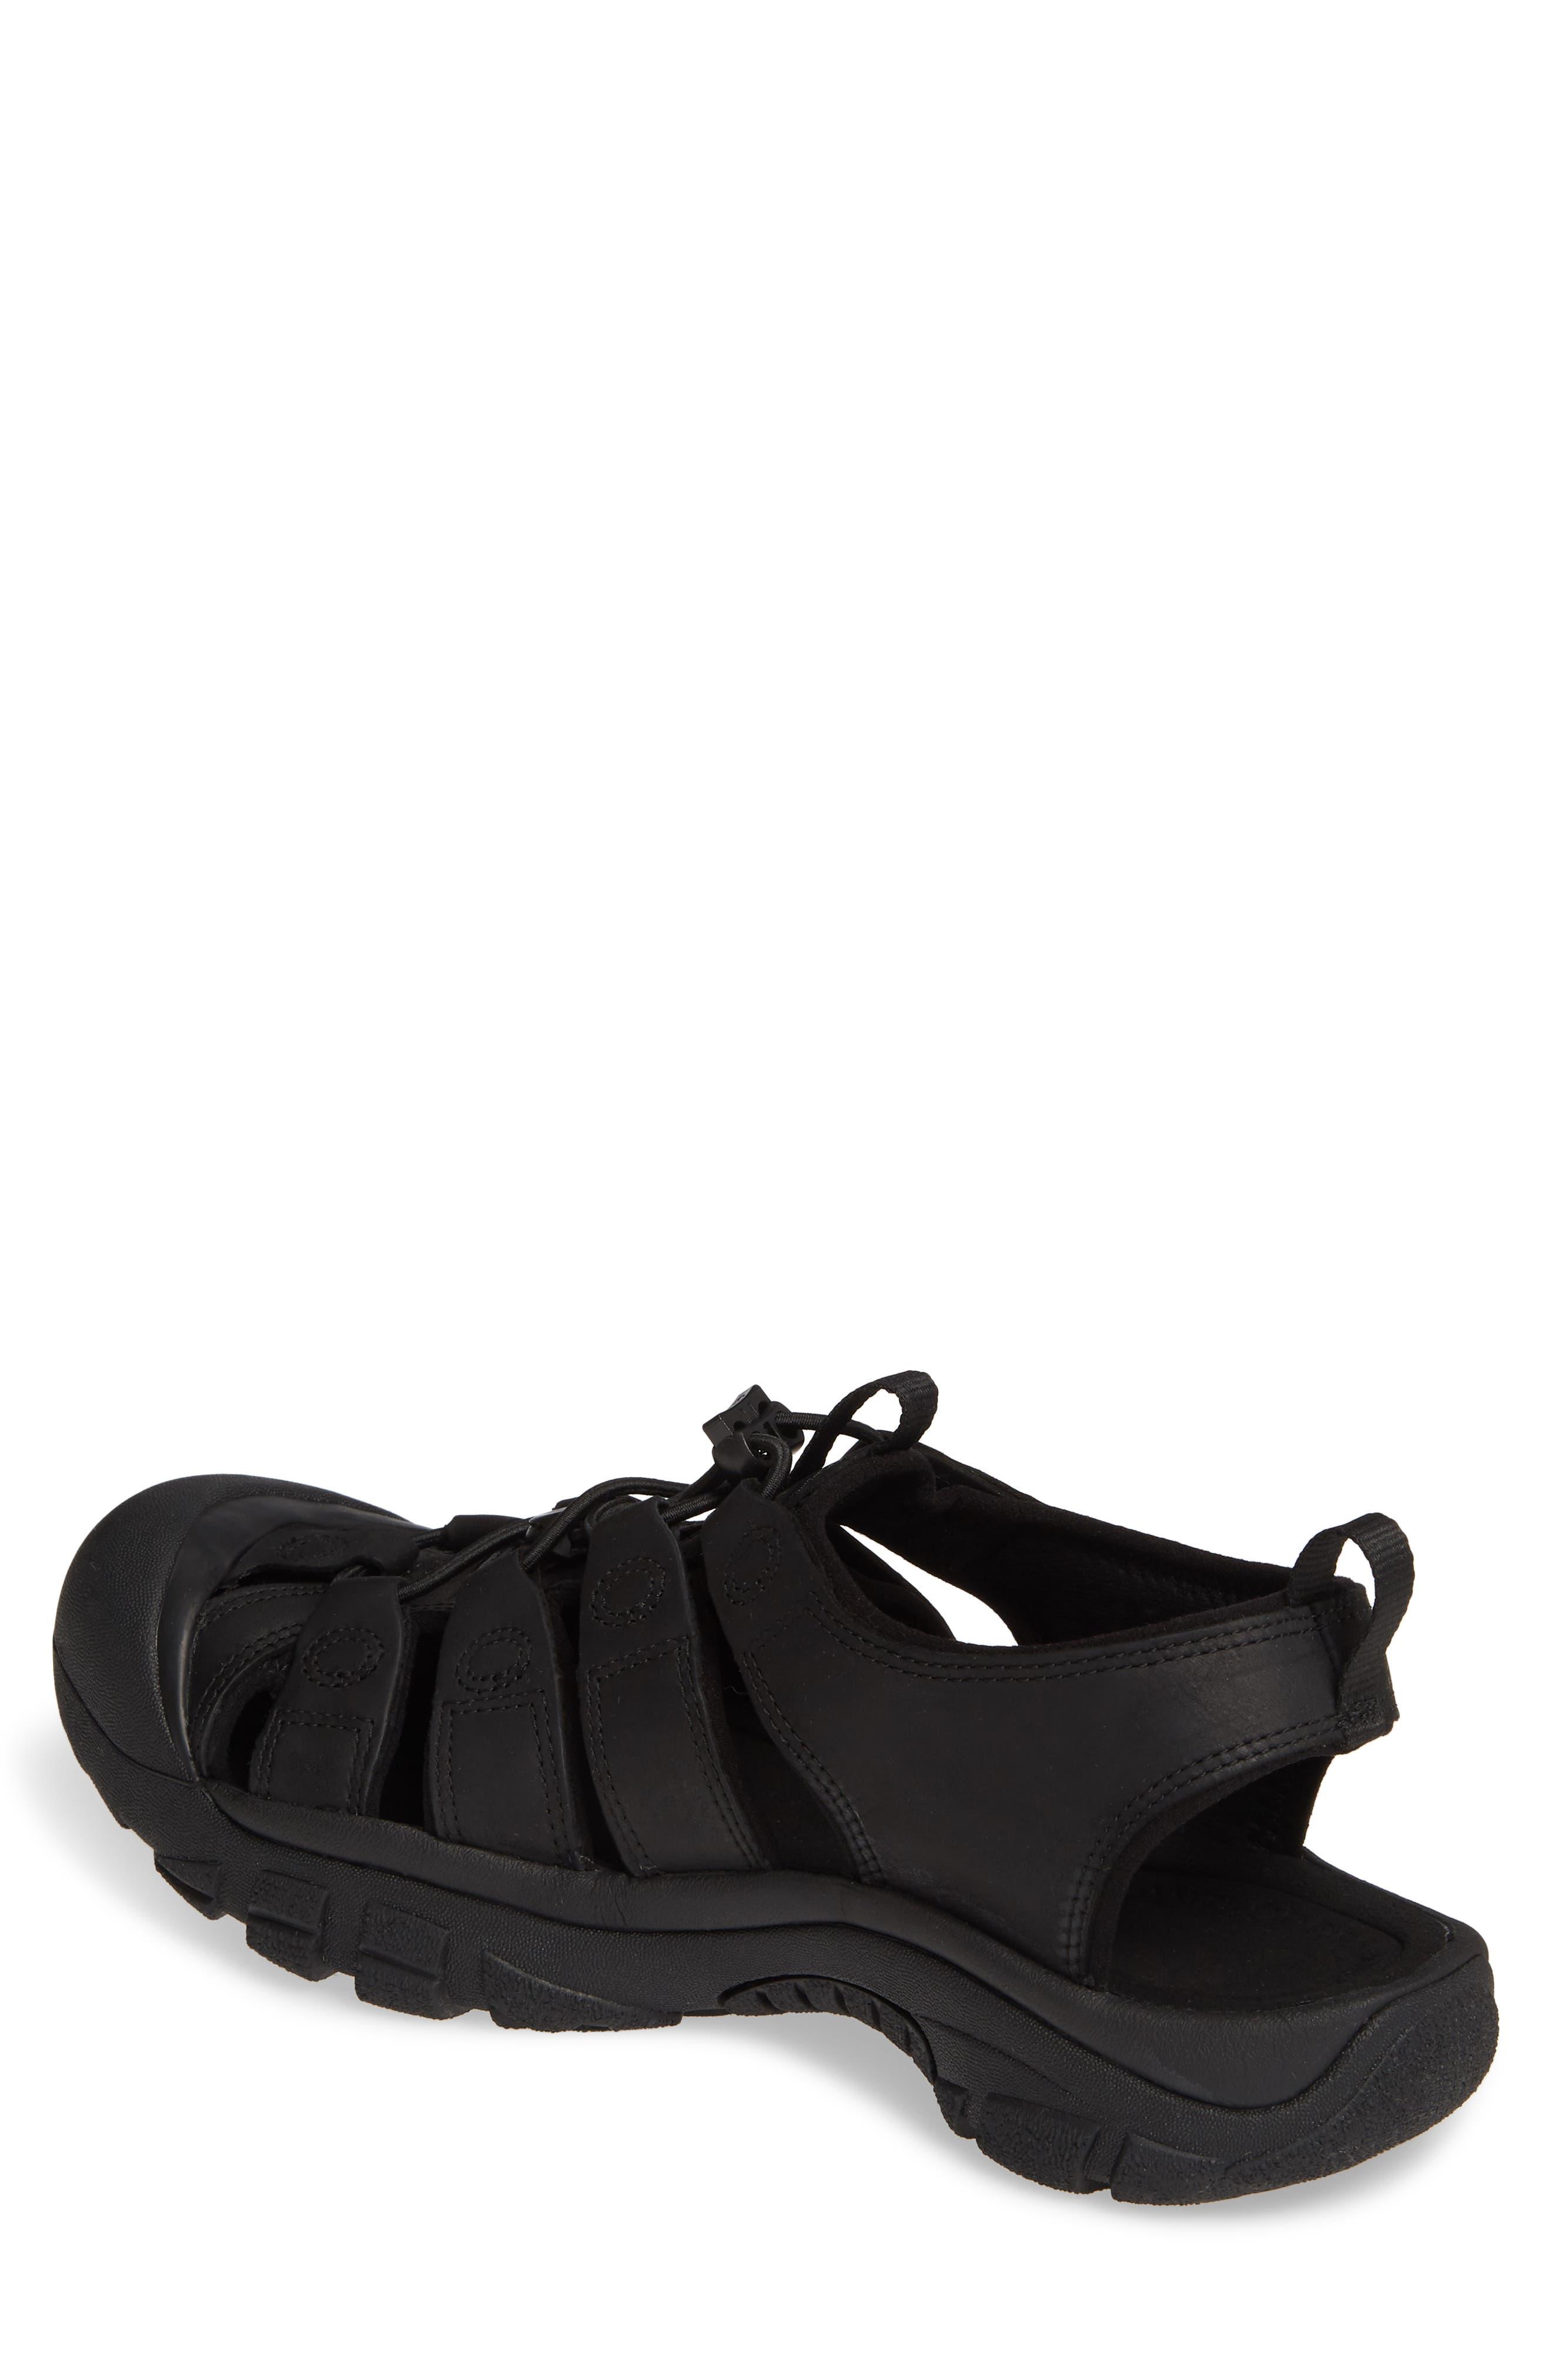 KEEN, 'Newport' Sandal, Alternate thumbnail 2, color, BLACK/ BLACK